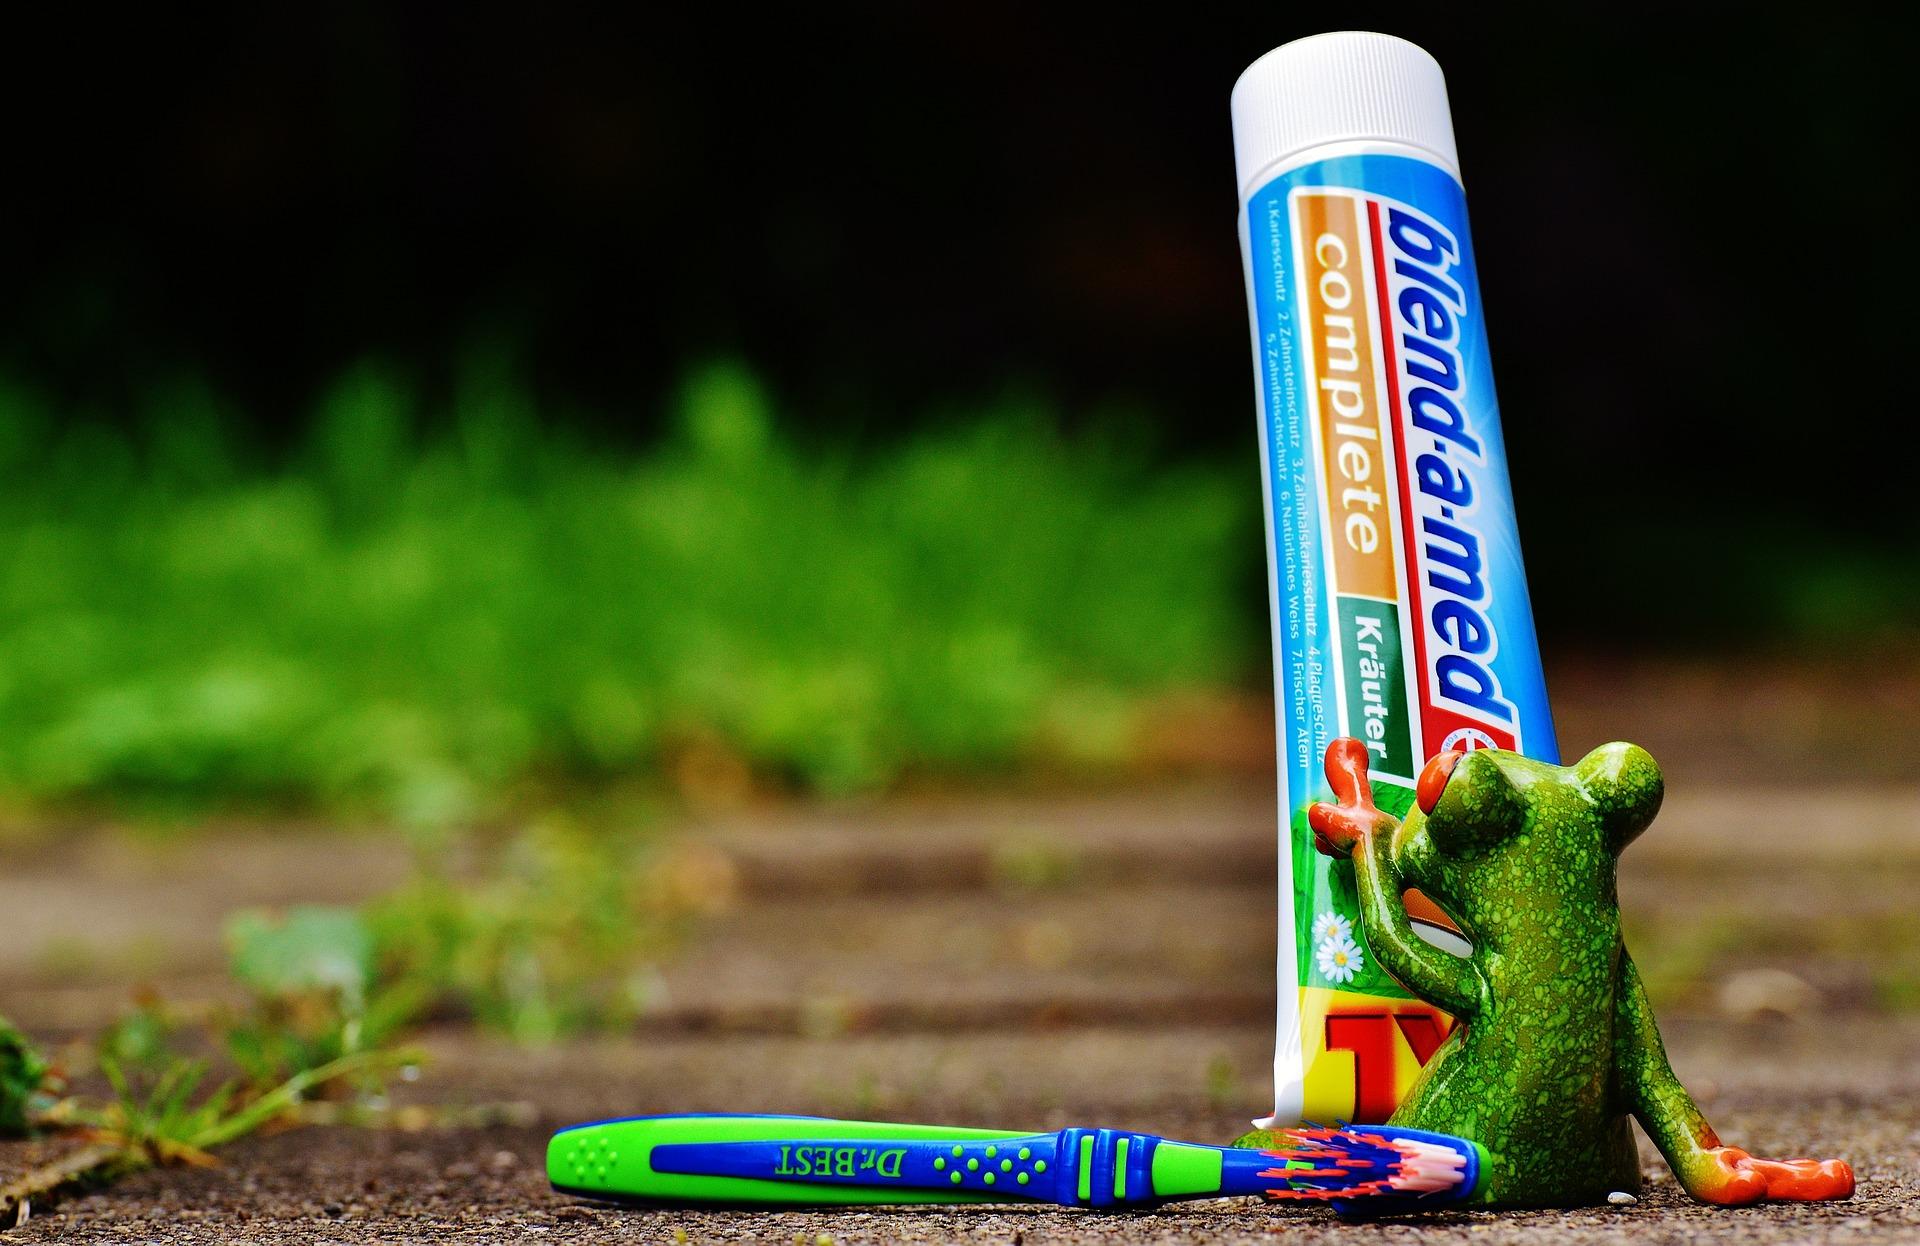 toothpaste 1446142 1920